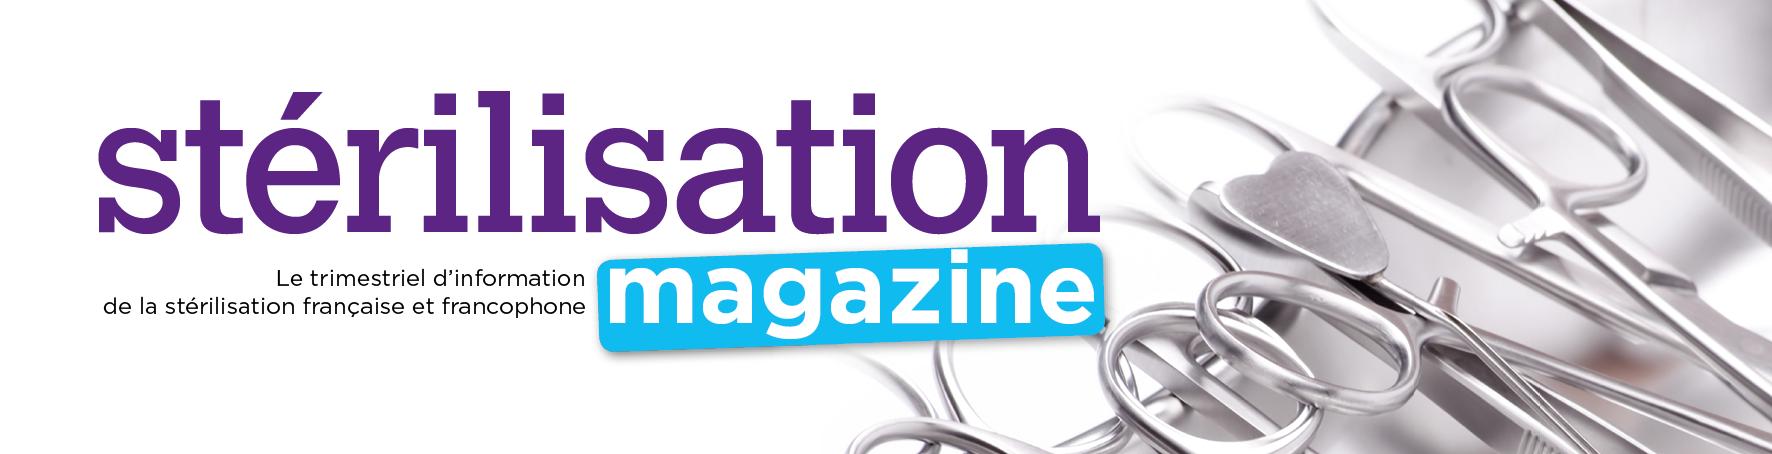 Stérilisation magazine